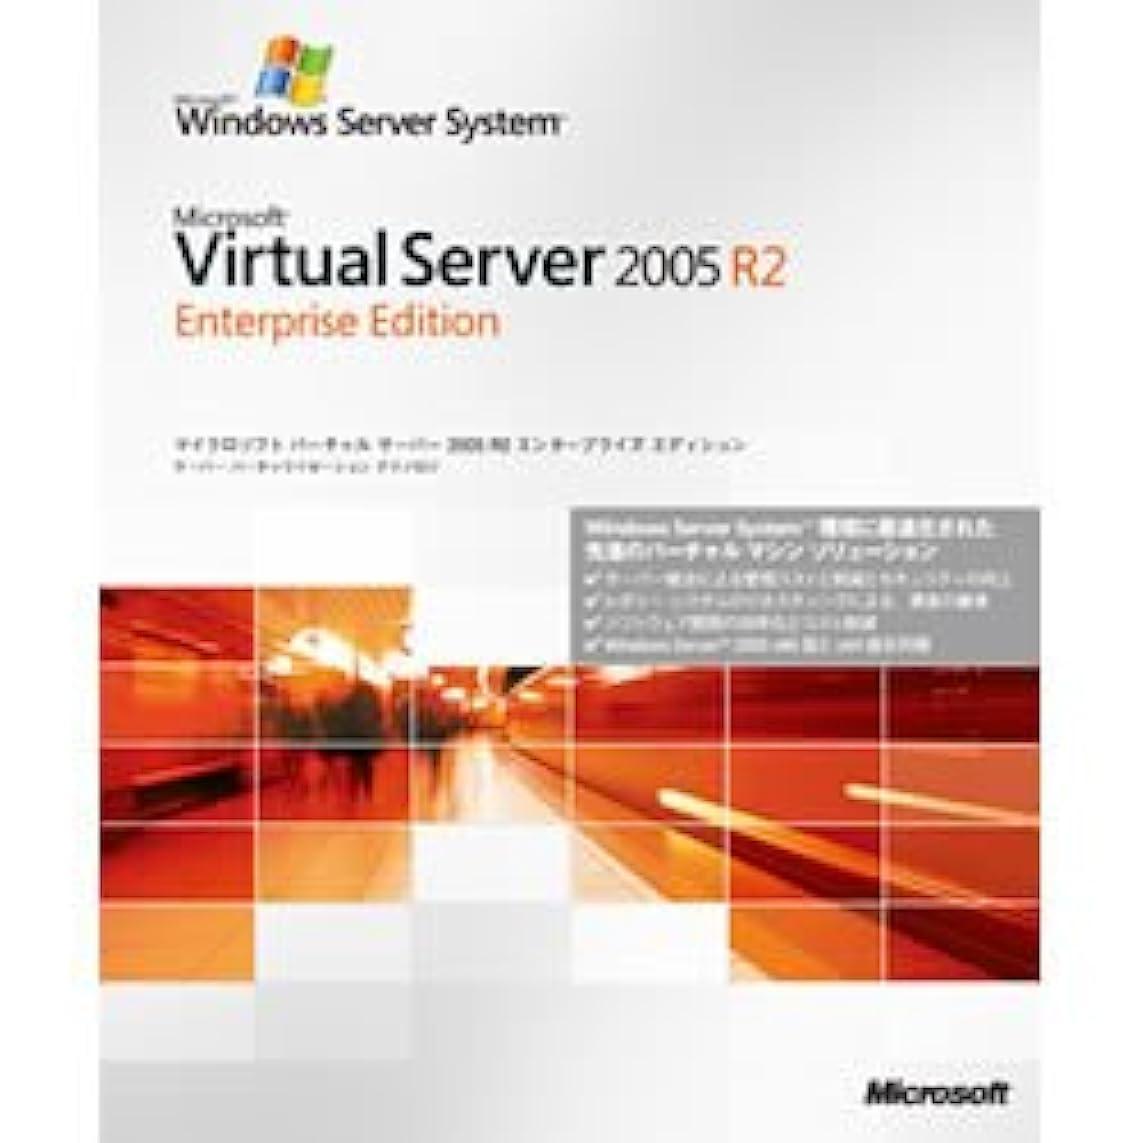 盗難突進言語Microsoft Virtual Server 2005 R2 Enterprise Edition 日本語版